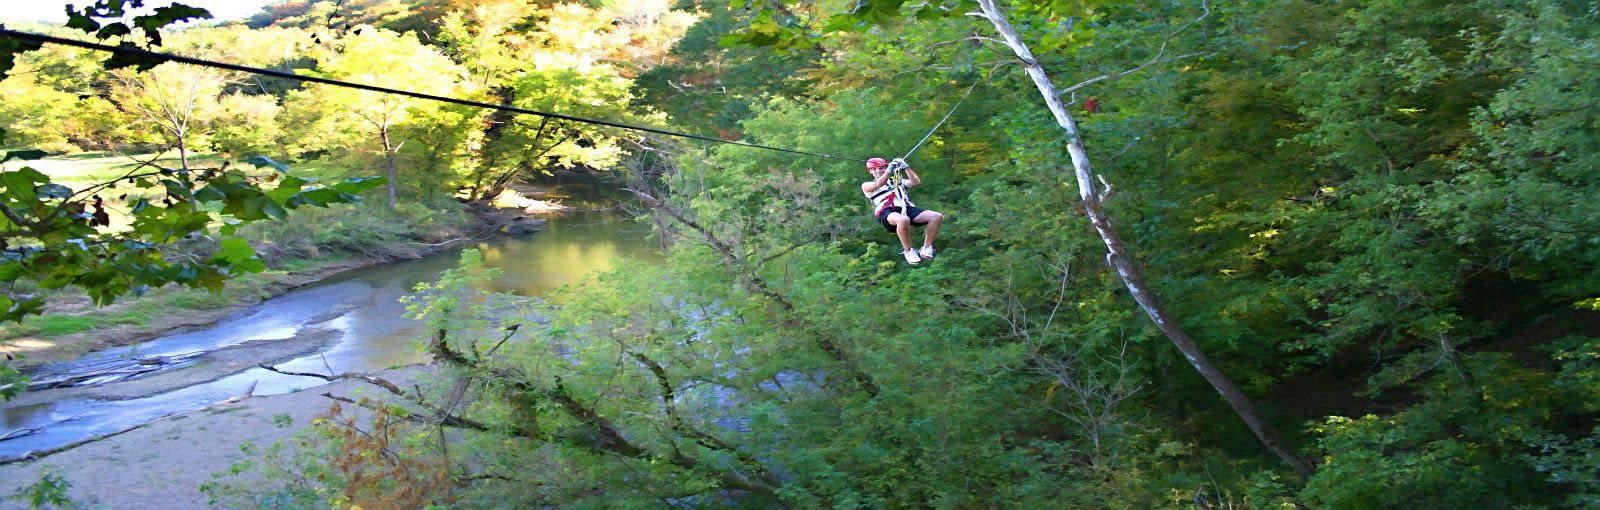 Hocking hills canopy tours cedar falls hocking hills